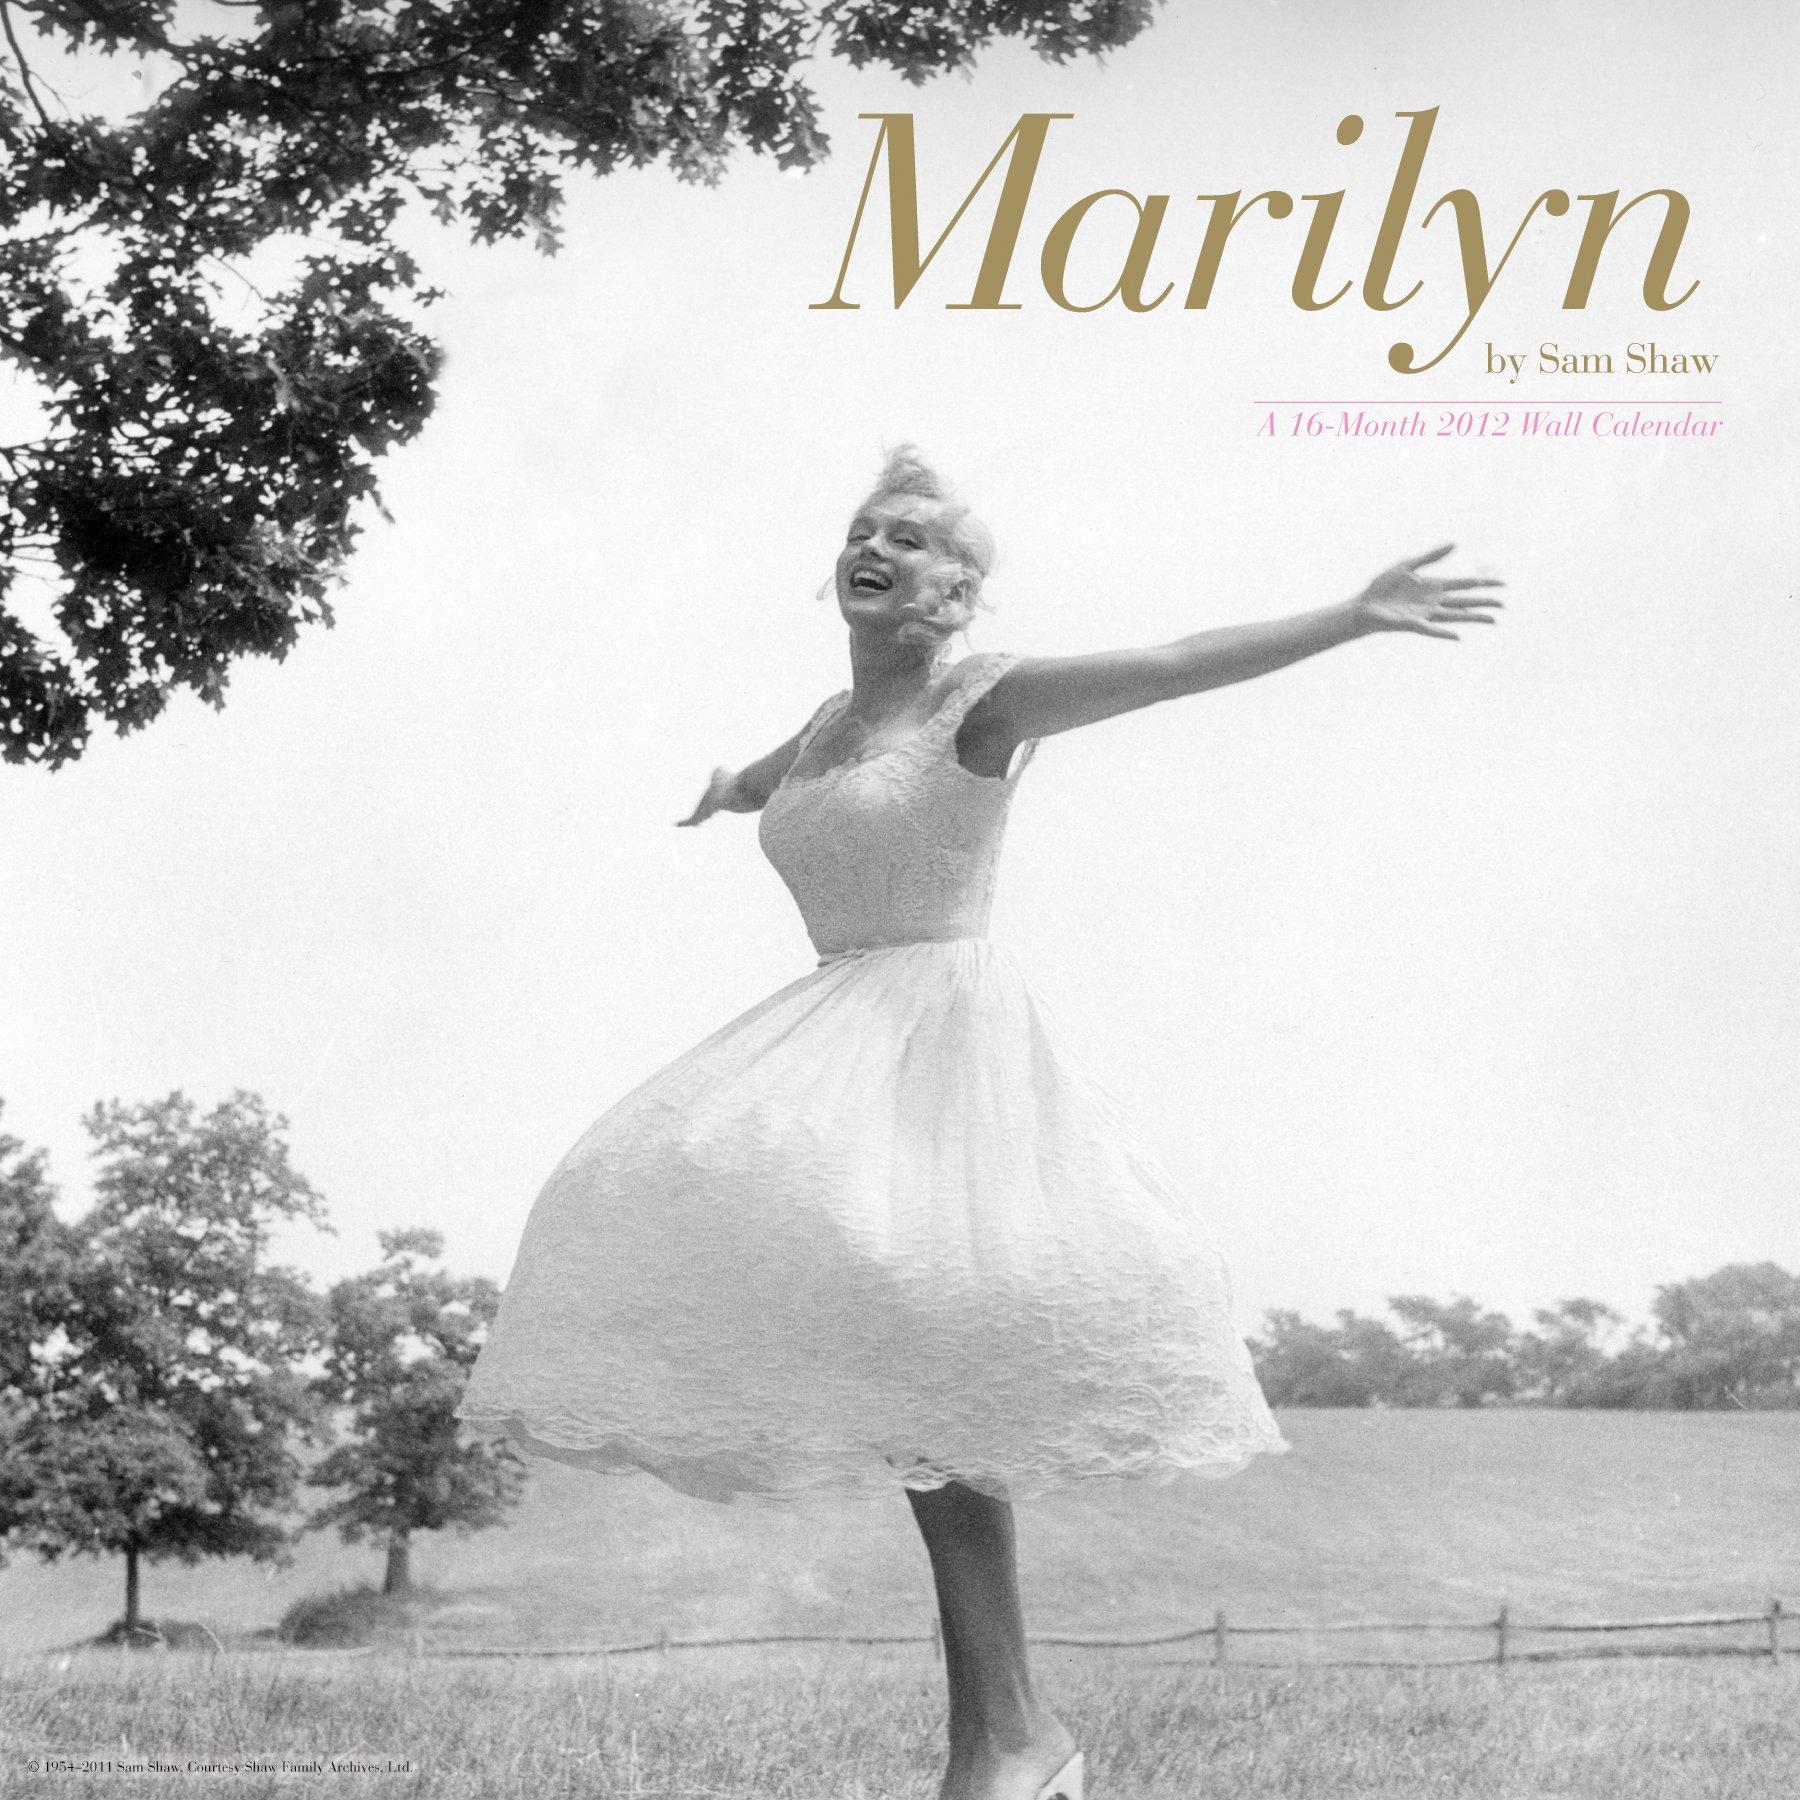 Marilyn Monroe 2012 Wall Calendar